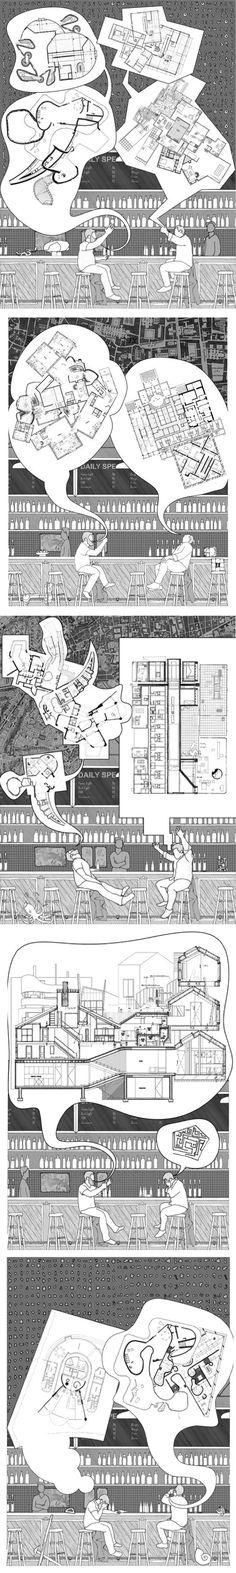 #arquitectura #dibujos #plantas #secciones